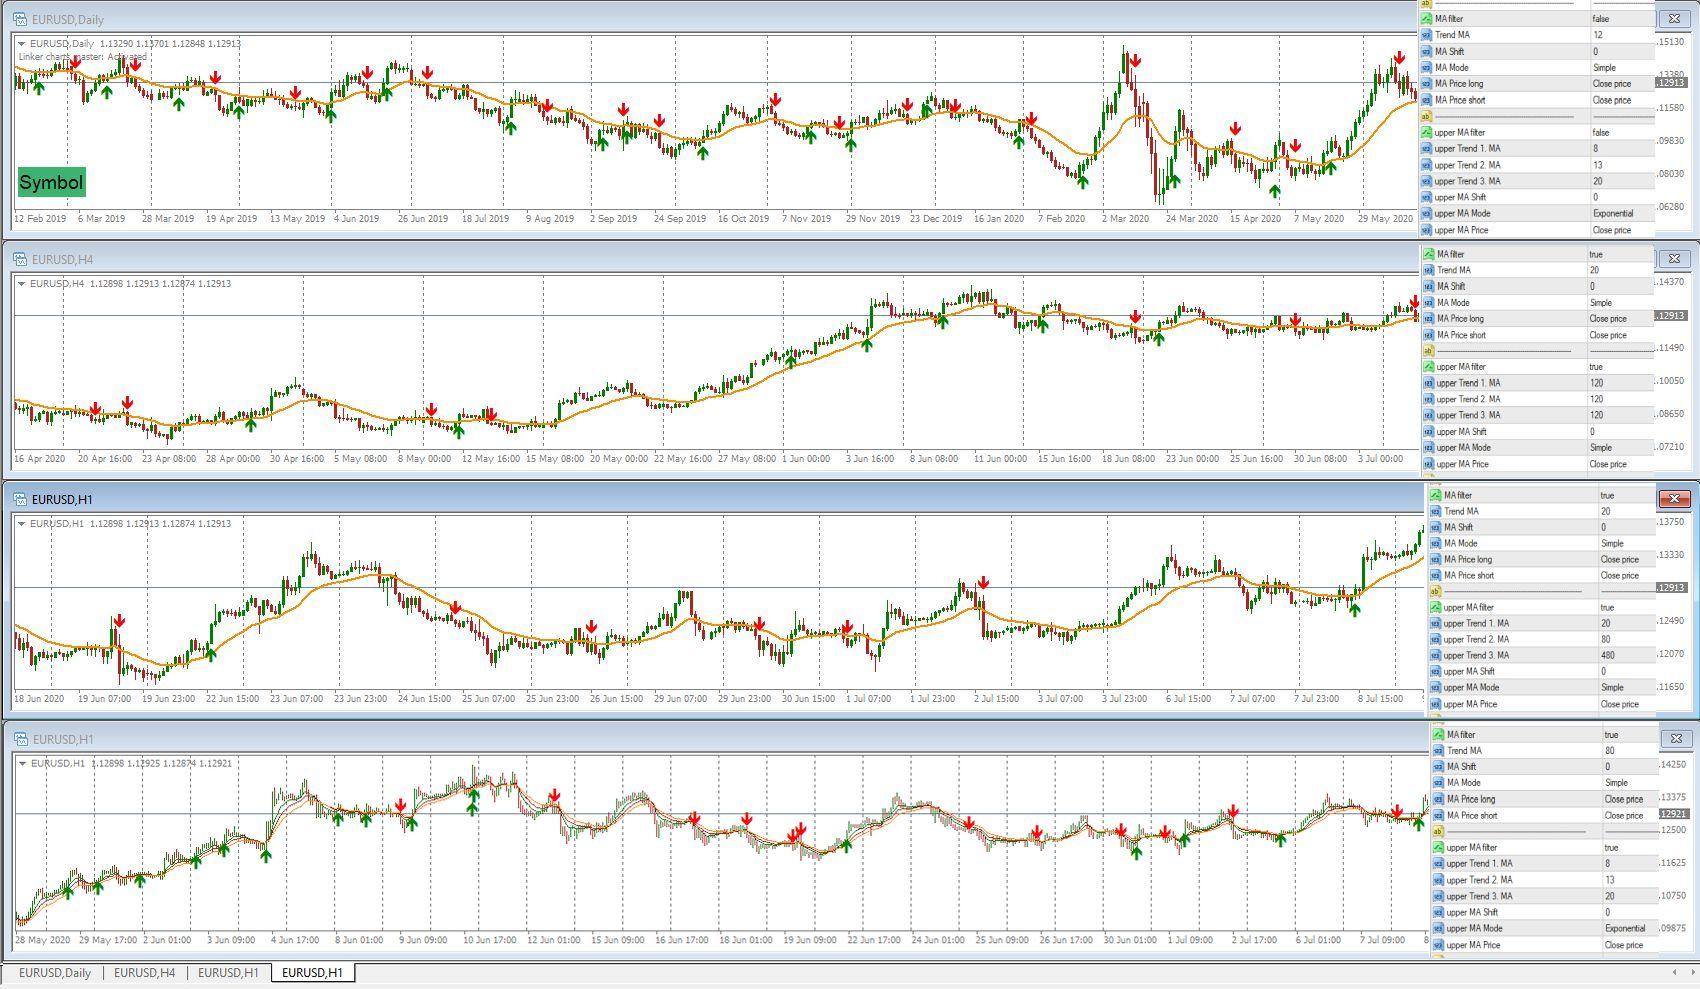 Parabolic-Sar Chart ClausForex.com